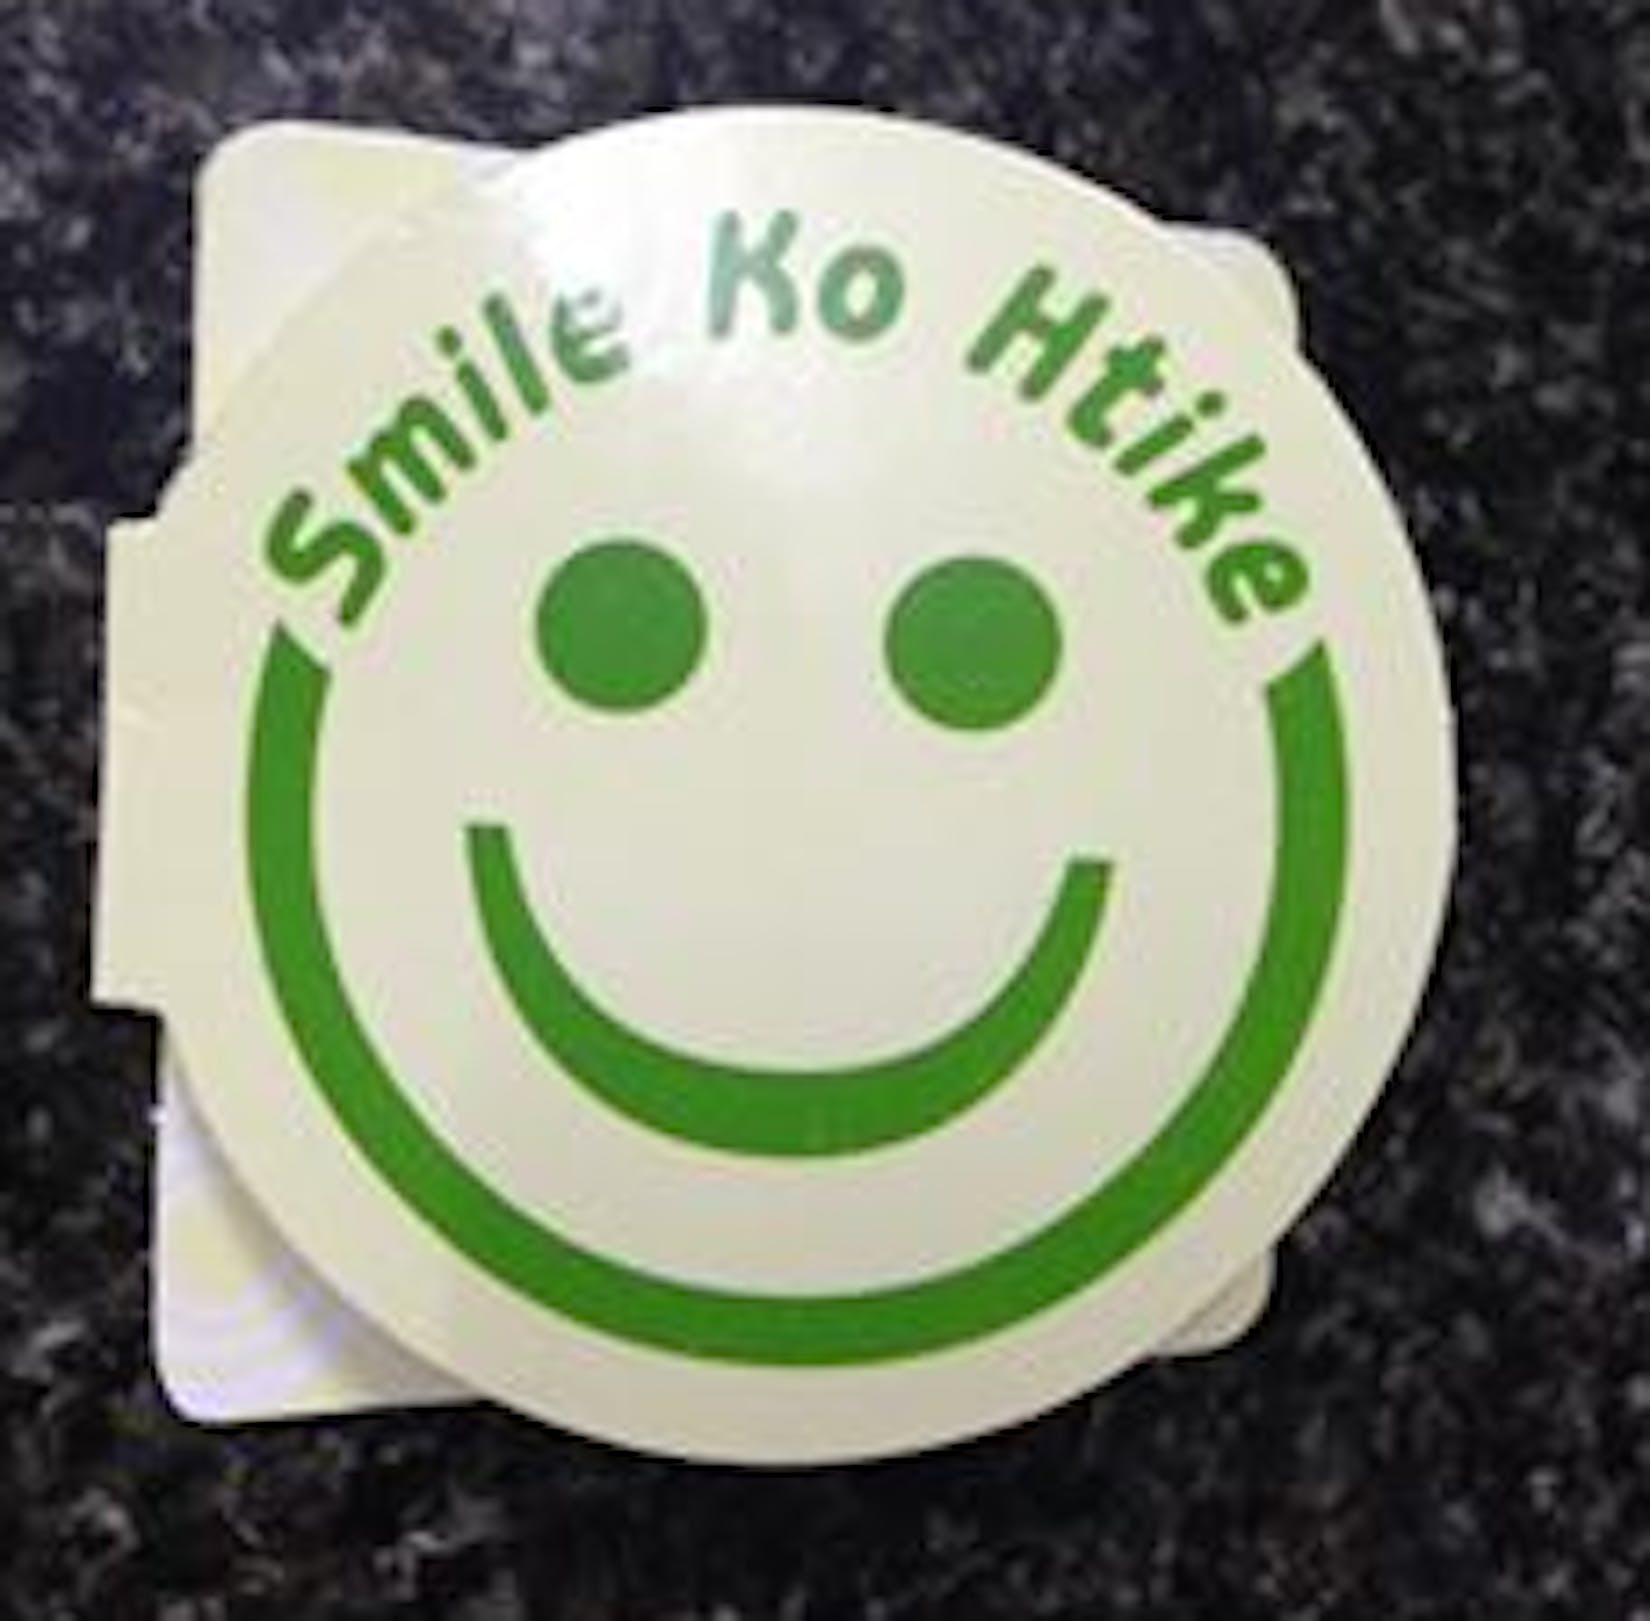 Smile Ko Htike Hair Stylist | Beauty